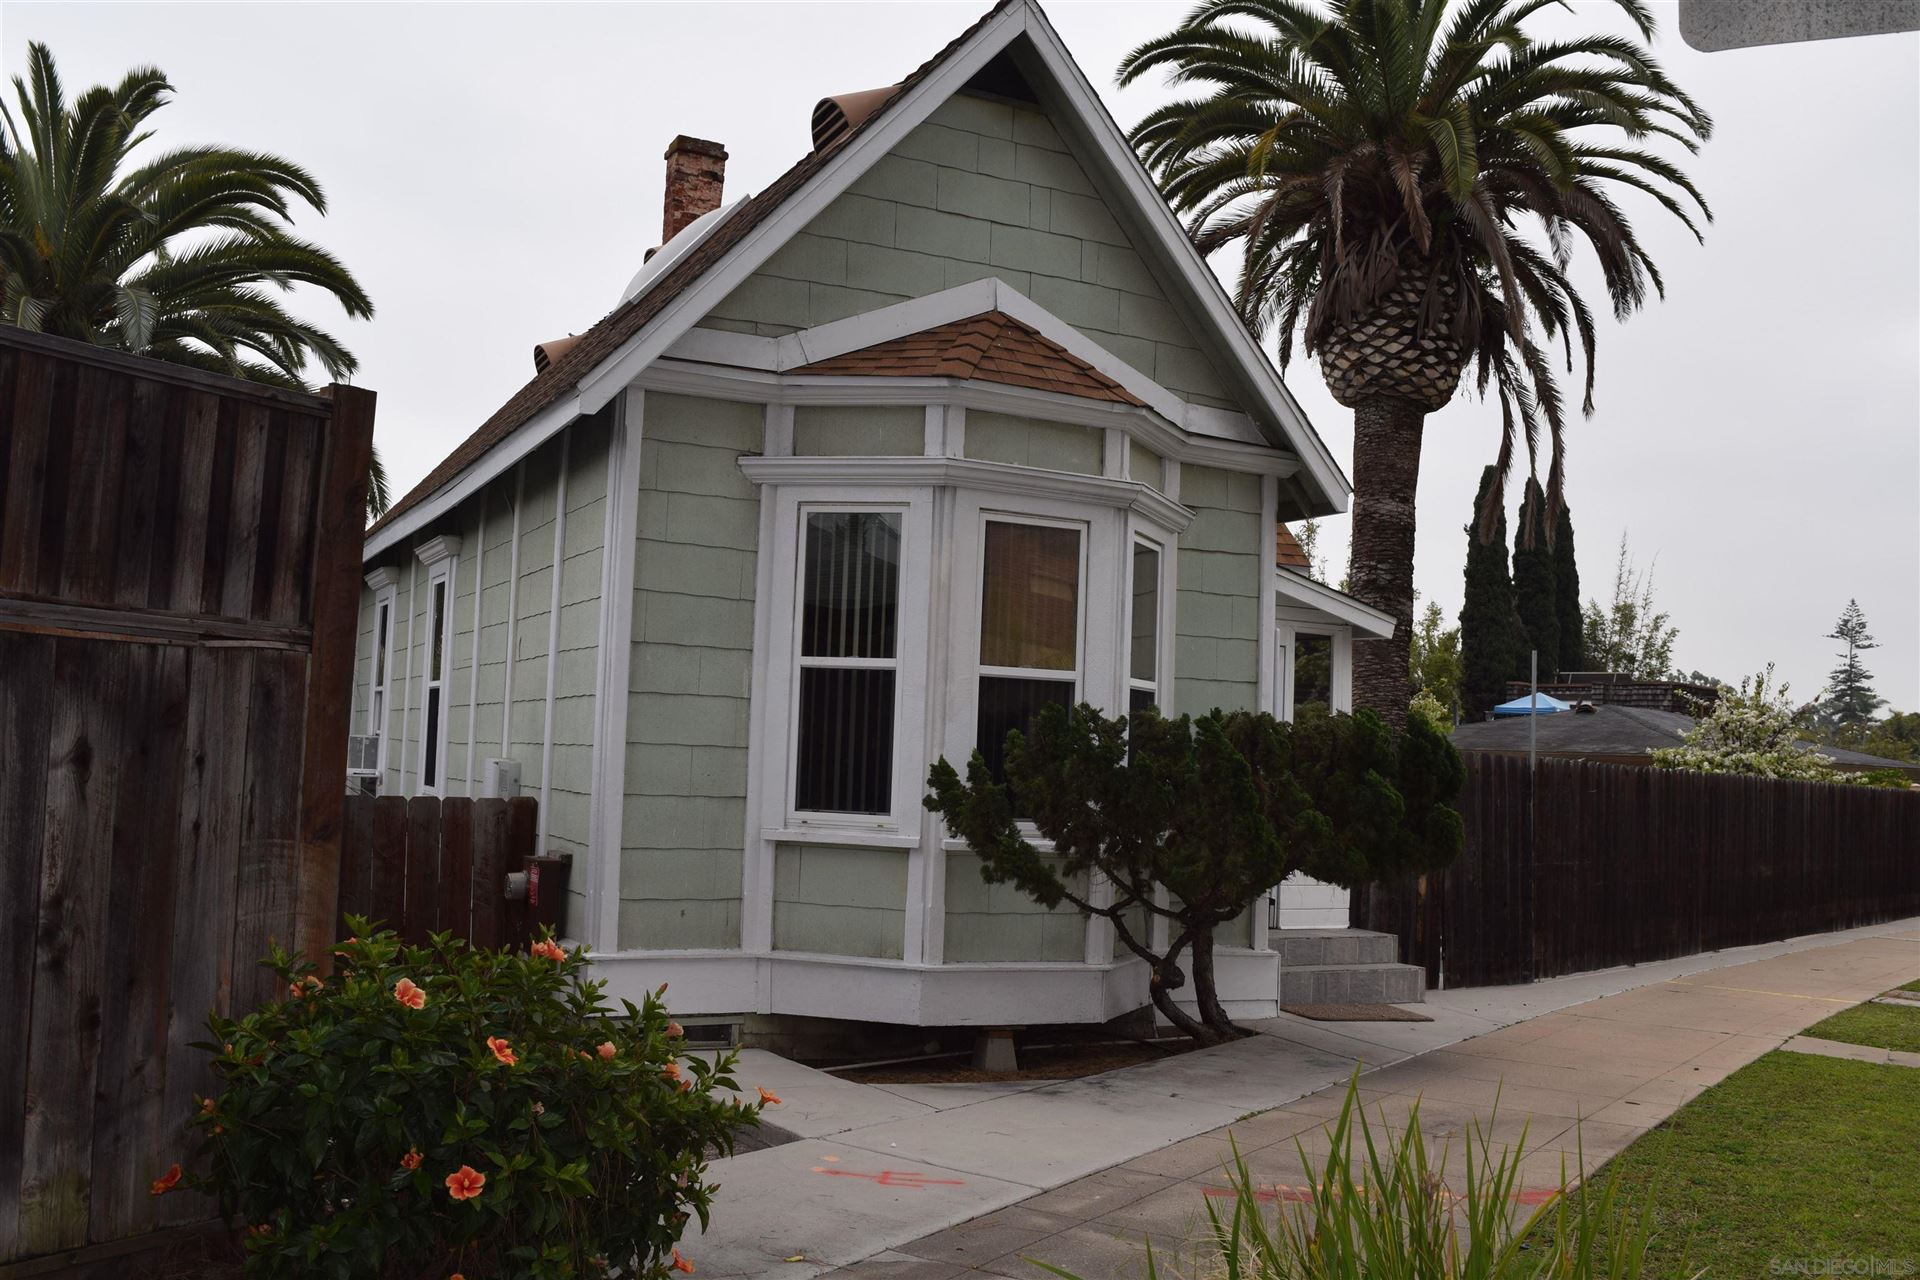 Photo of 305 Pomona Avenue, Coronado, CA 92118 (MLS # 210028336)